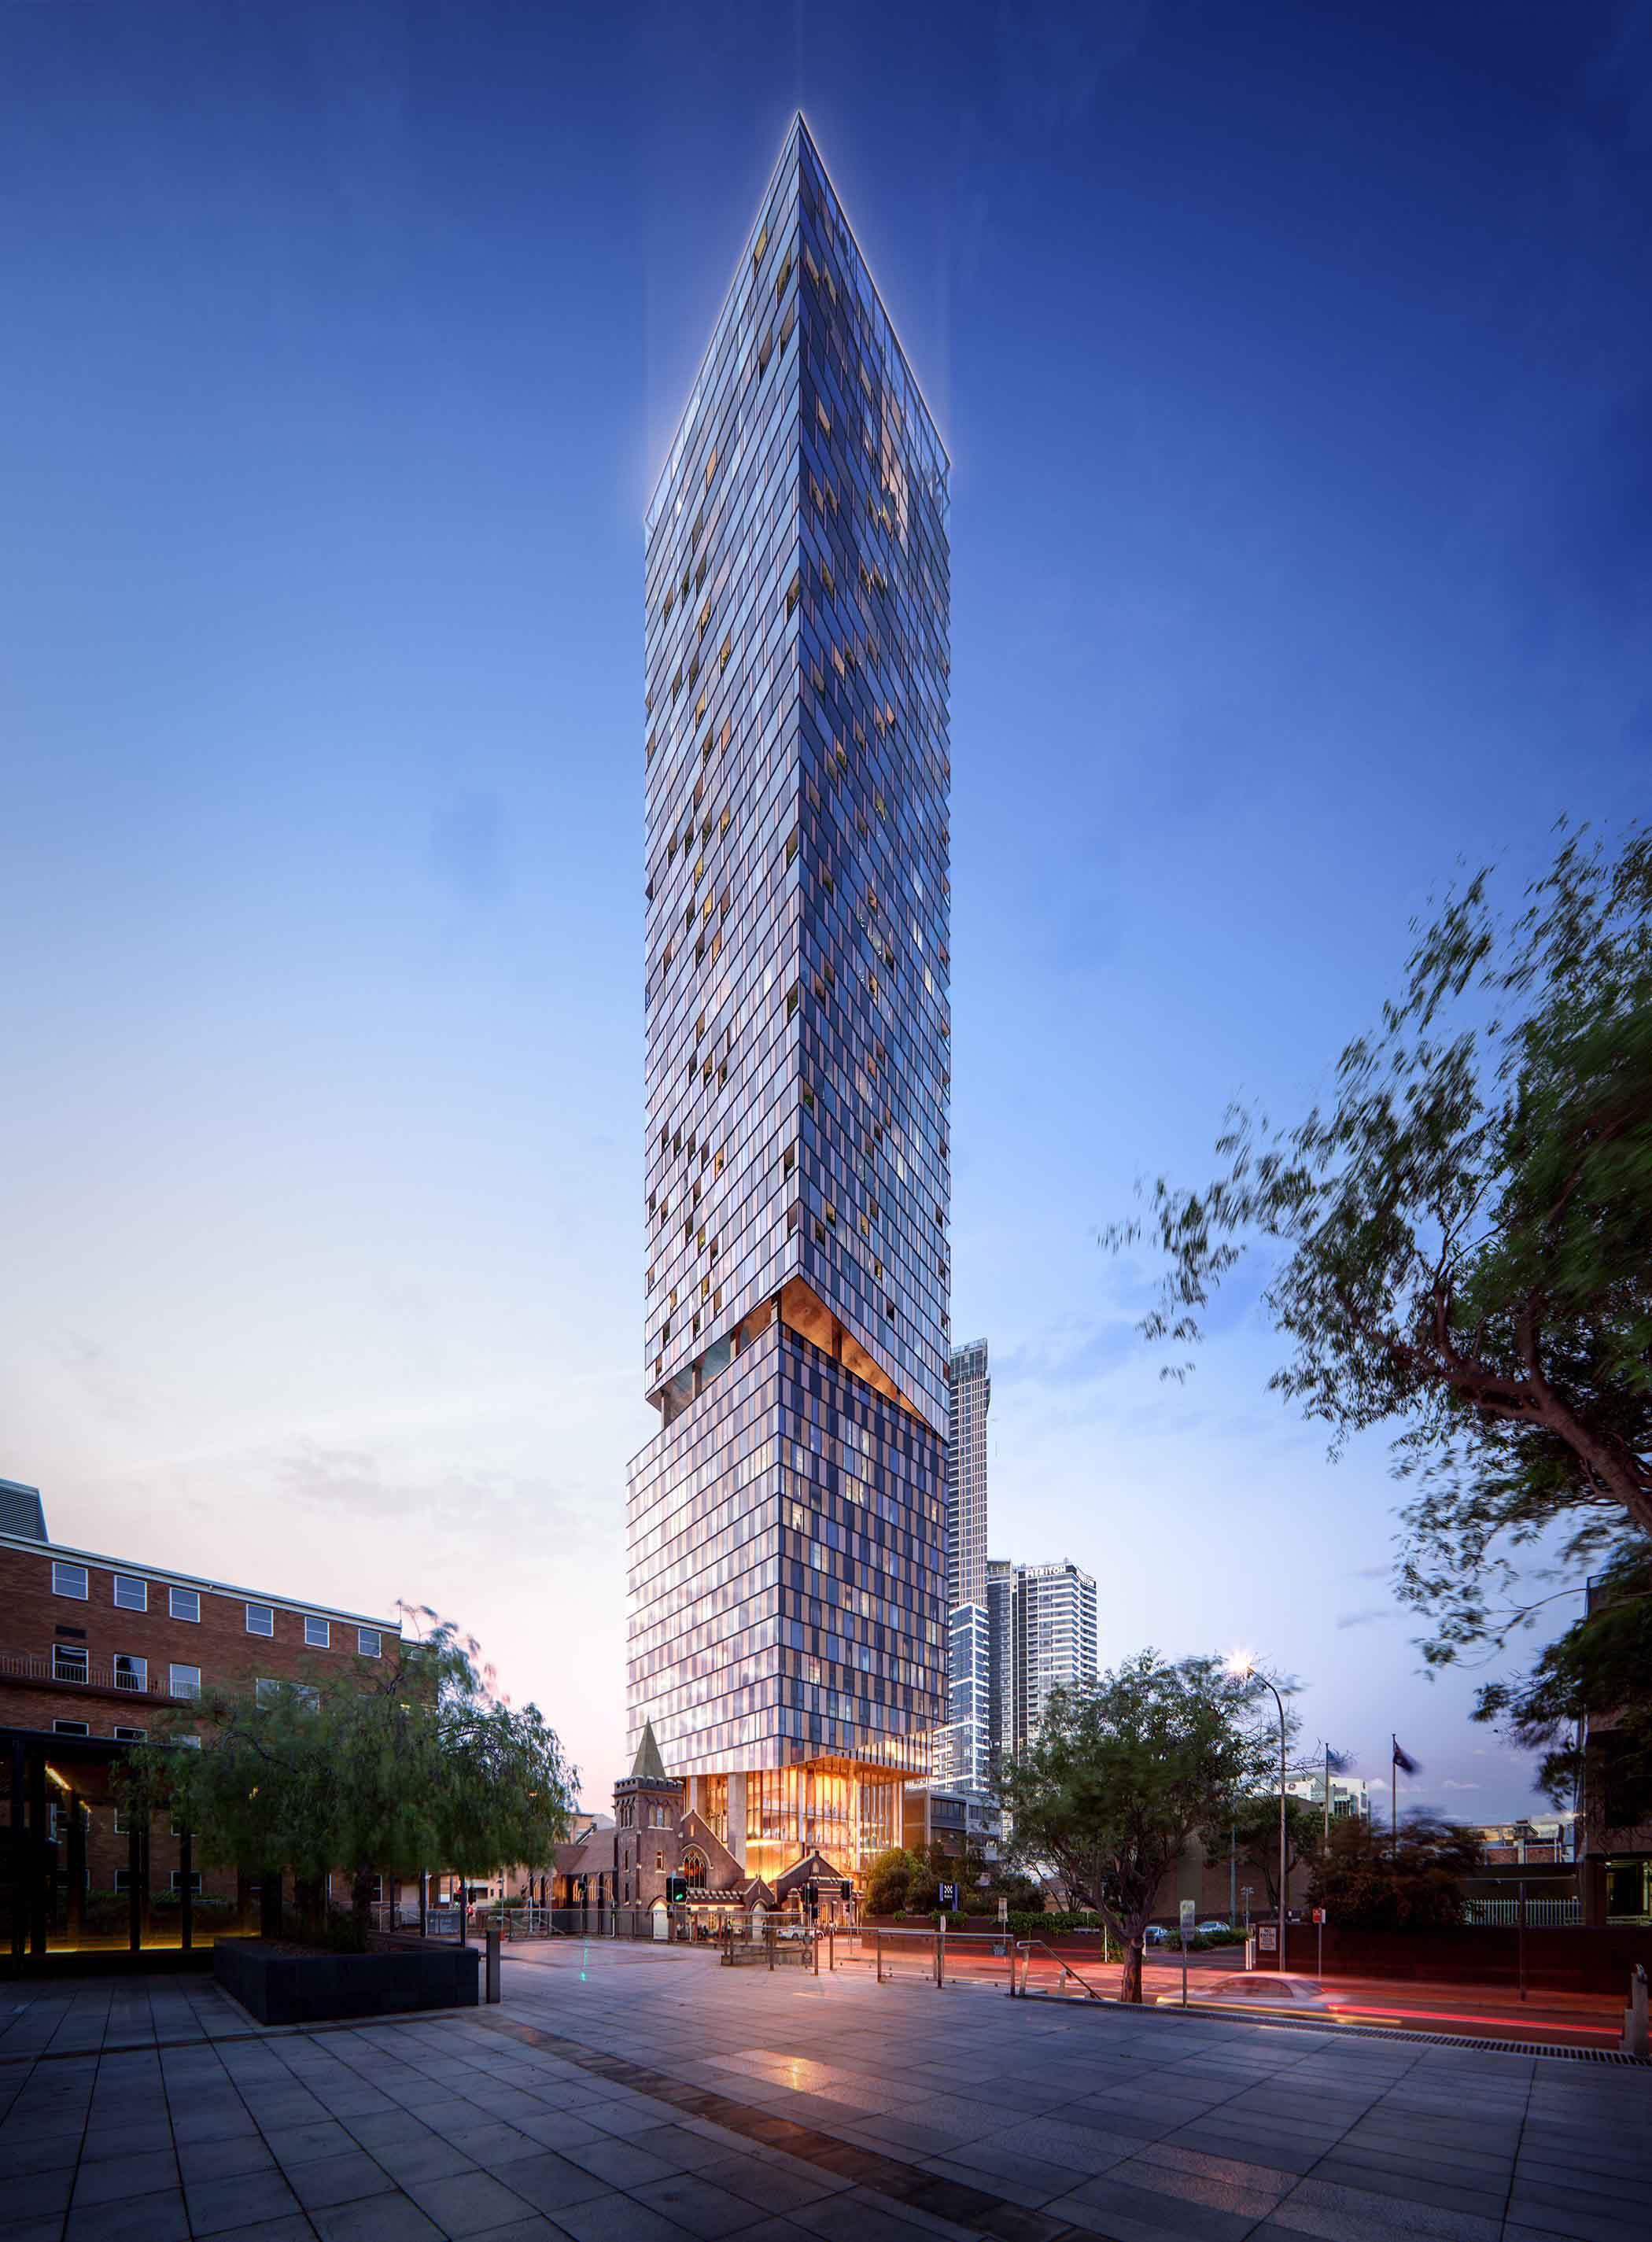 Standard Hotel Rooftop >> Sydney's highest rooftop bar: 8 Phillip Street by Woods Bagot | Australian Design Review